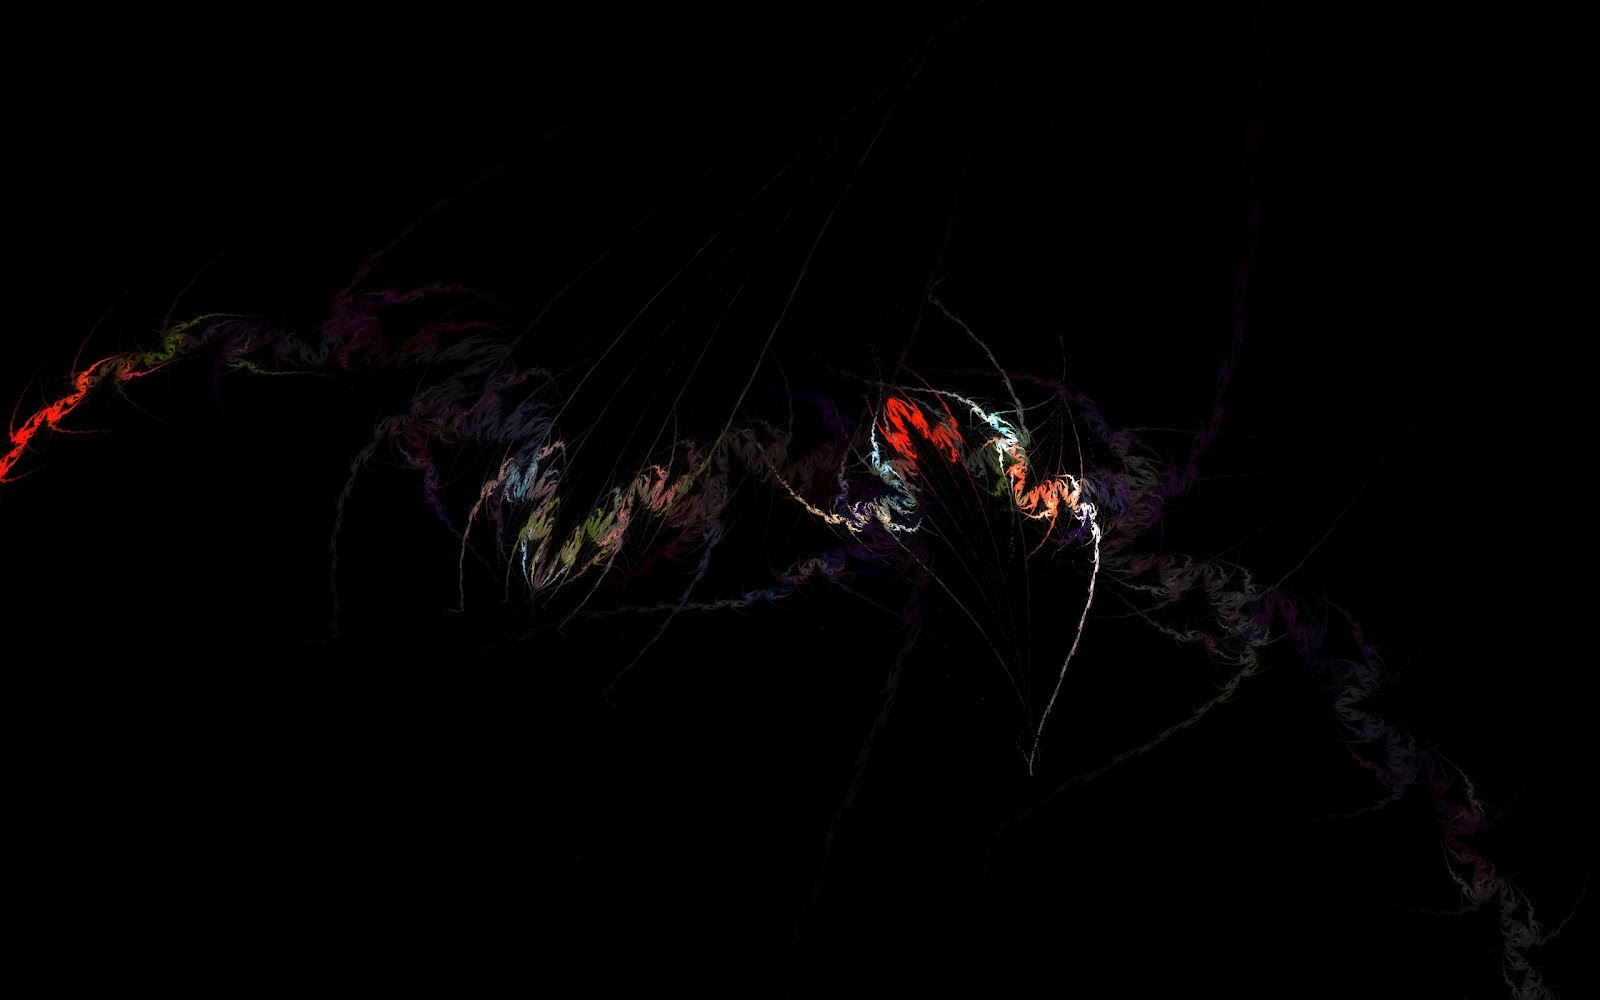 Black Windows - Black epreet black wallpapers widescreen